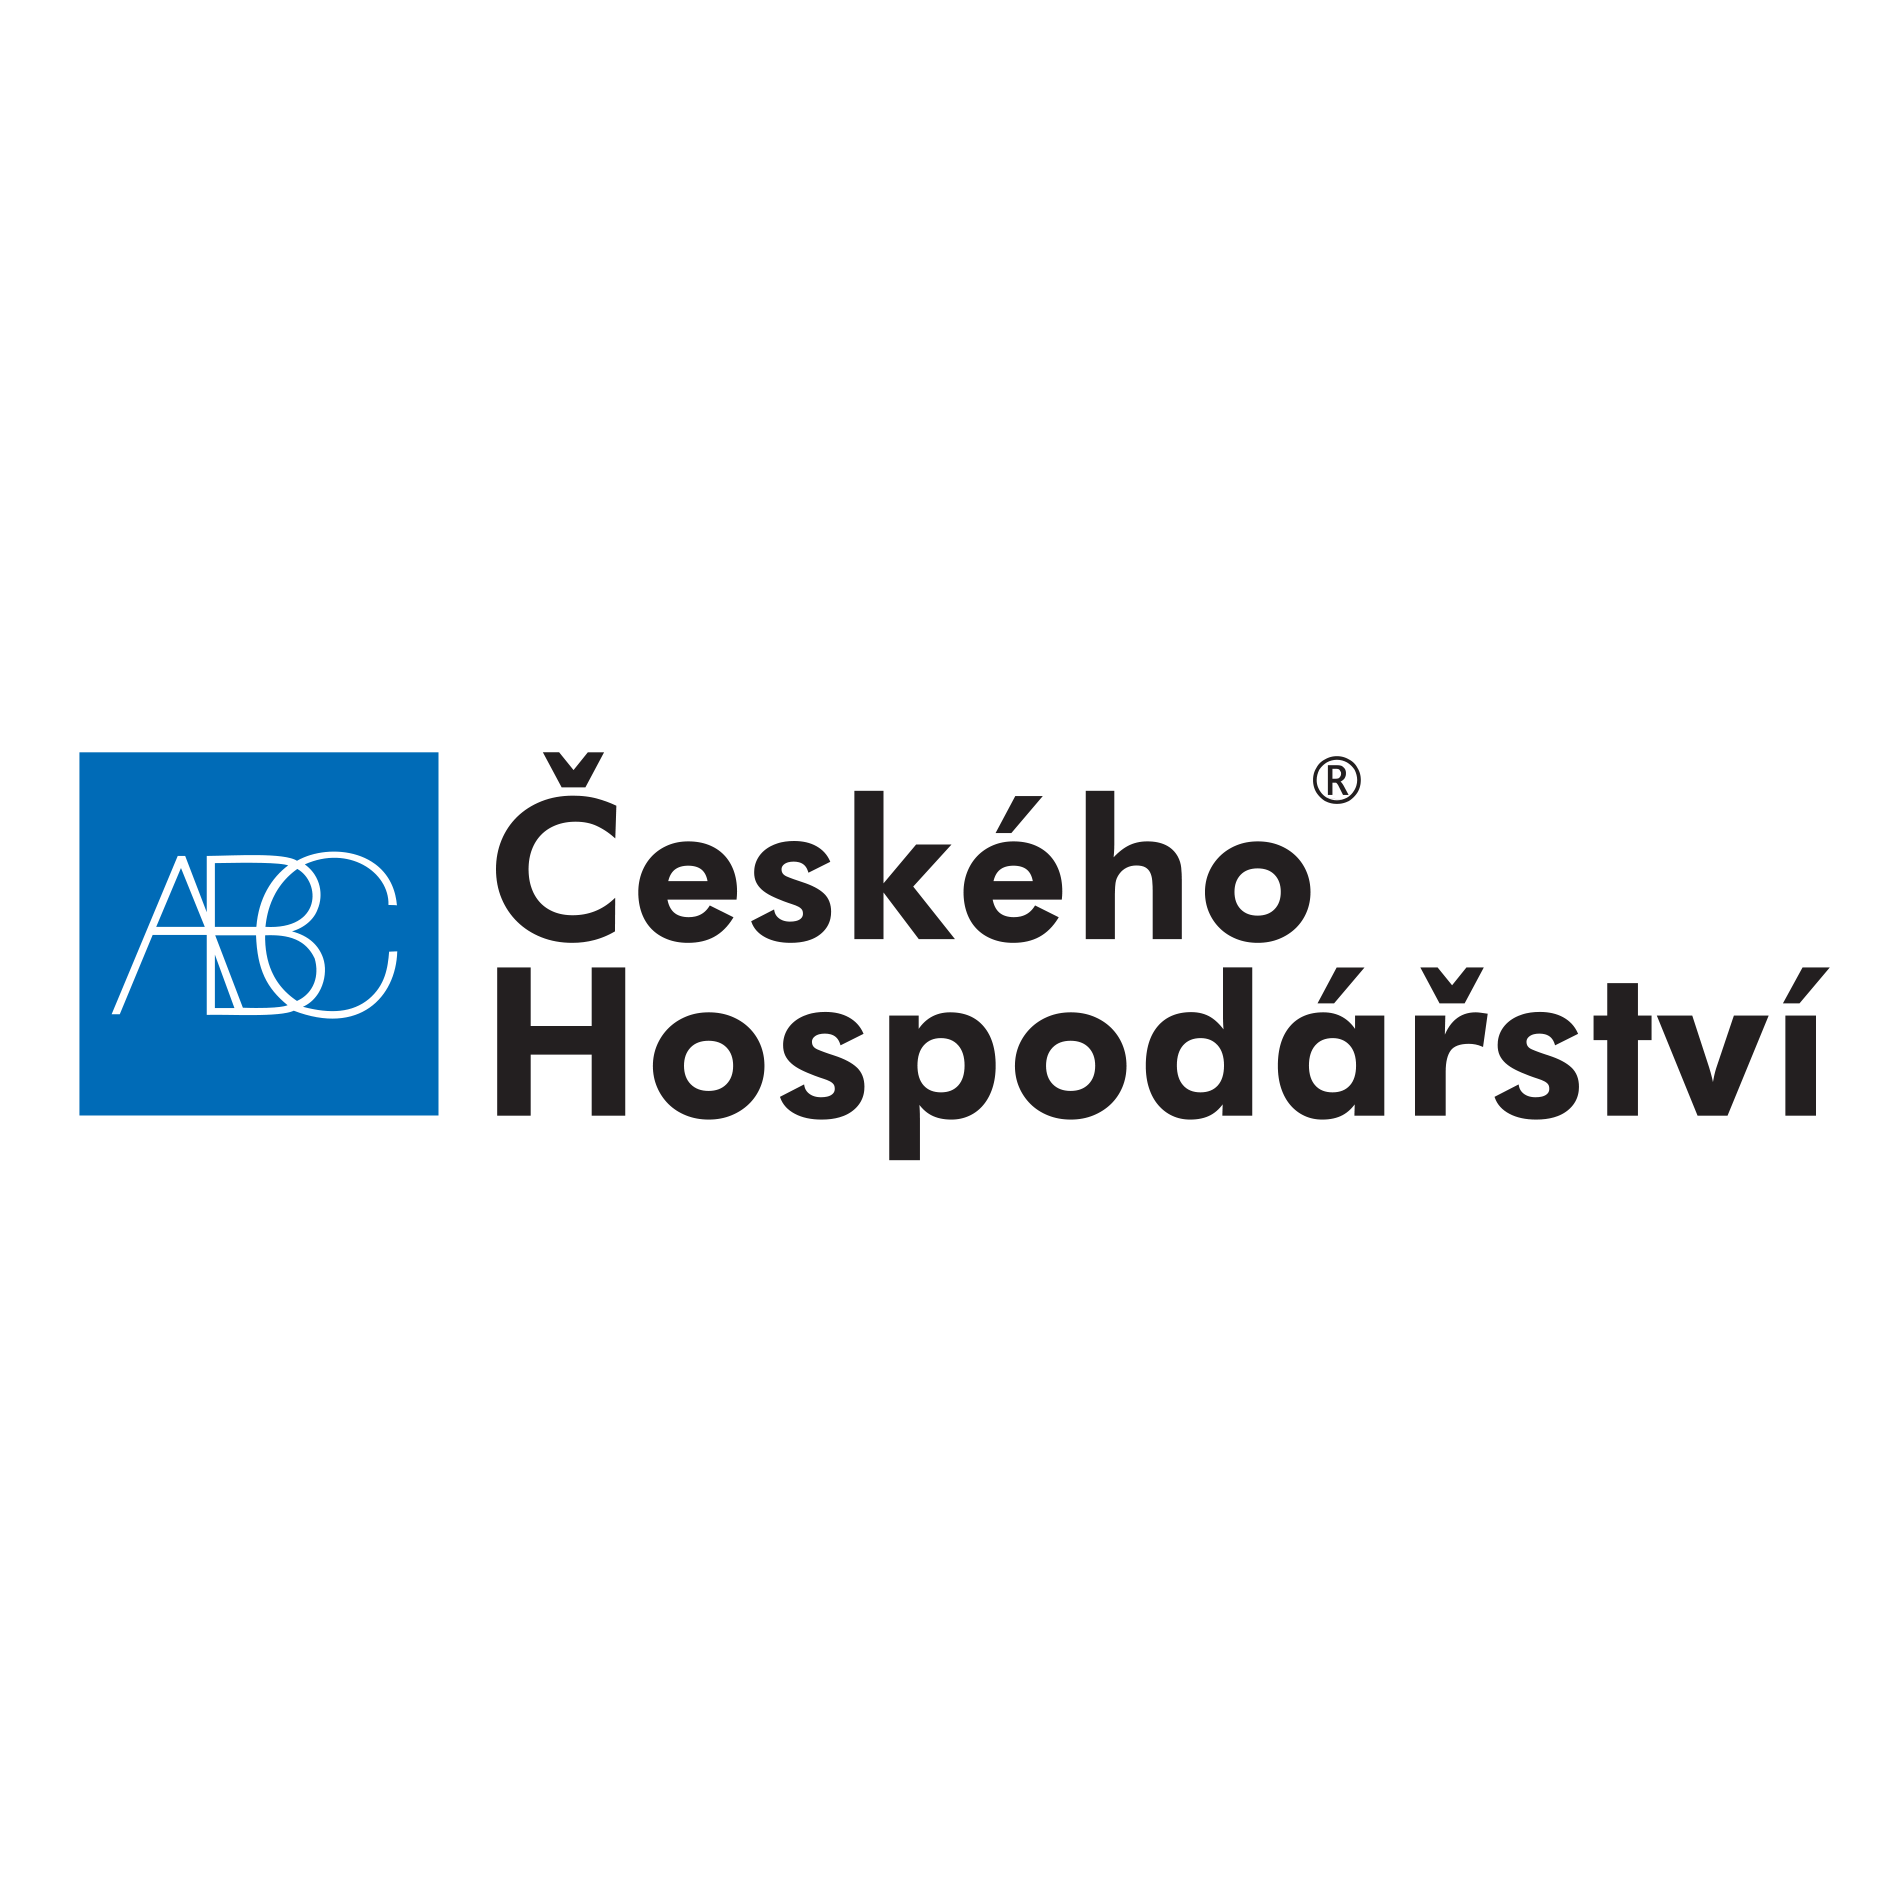 abc-ceskaho-hospodarstvi-logo